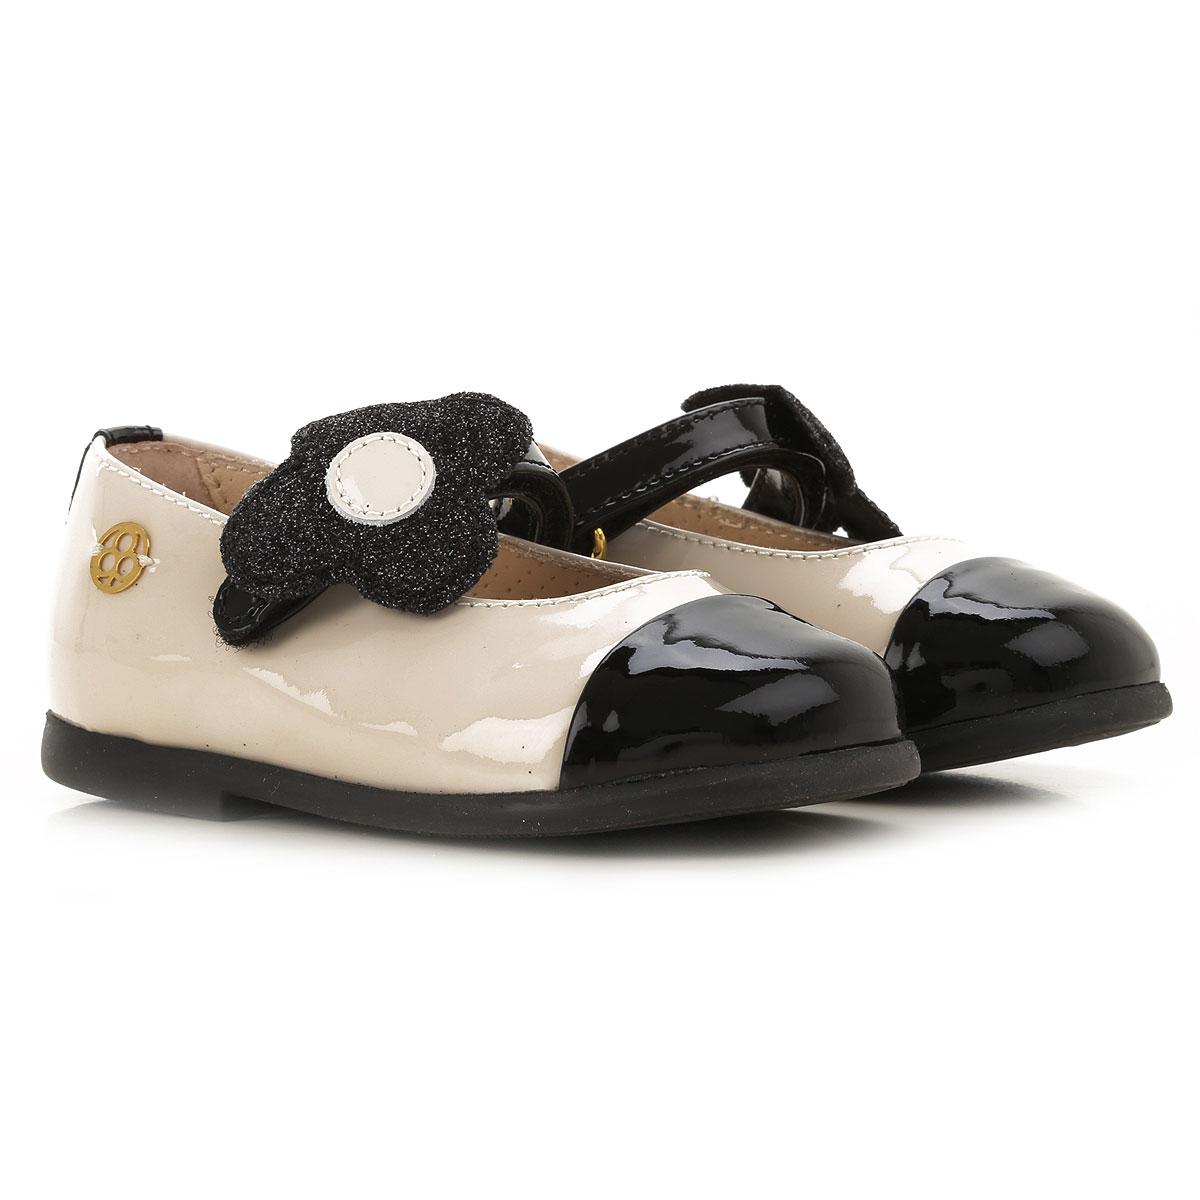 Florens Kids Shoes for Girls On Sale, Milk, Rubber, 2019, 18 19 20 21 22 23 24